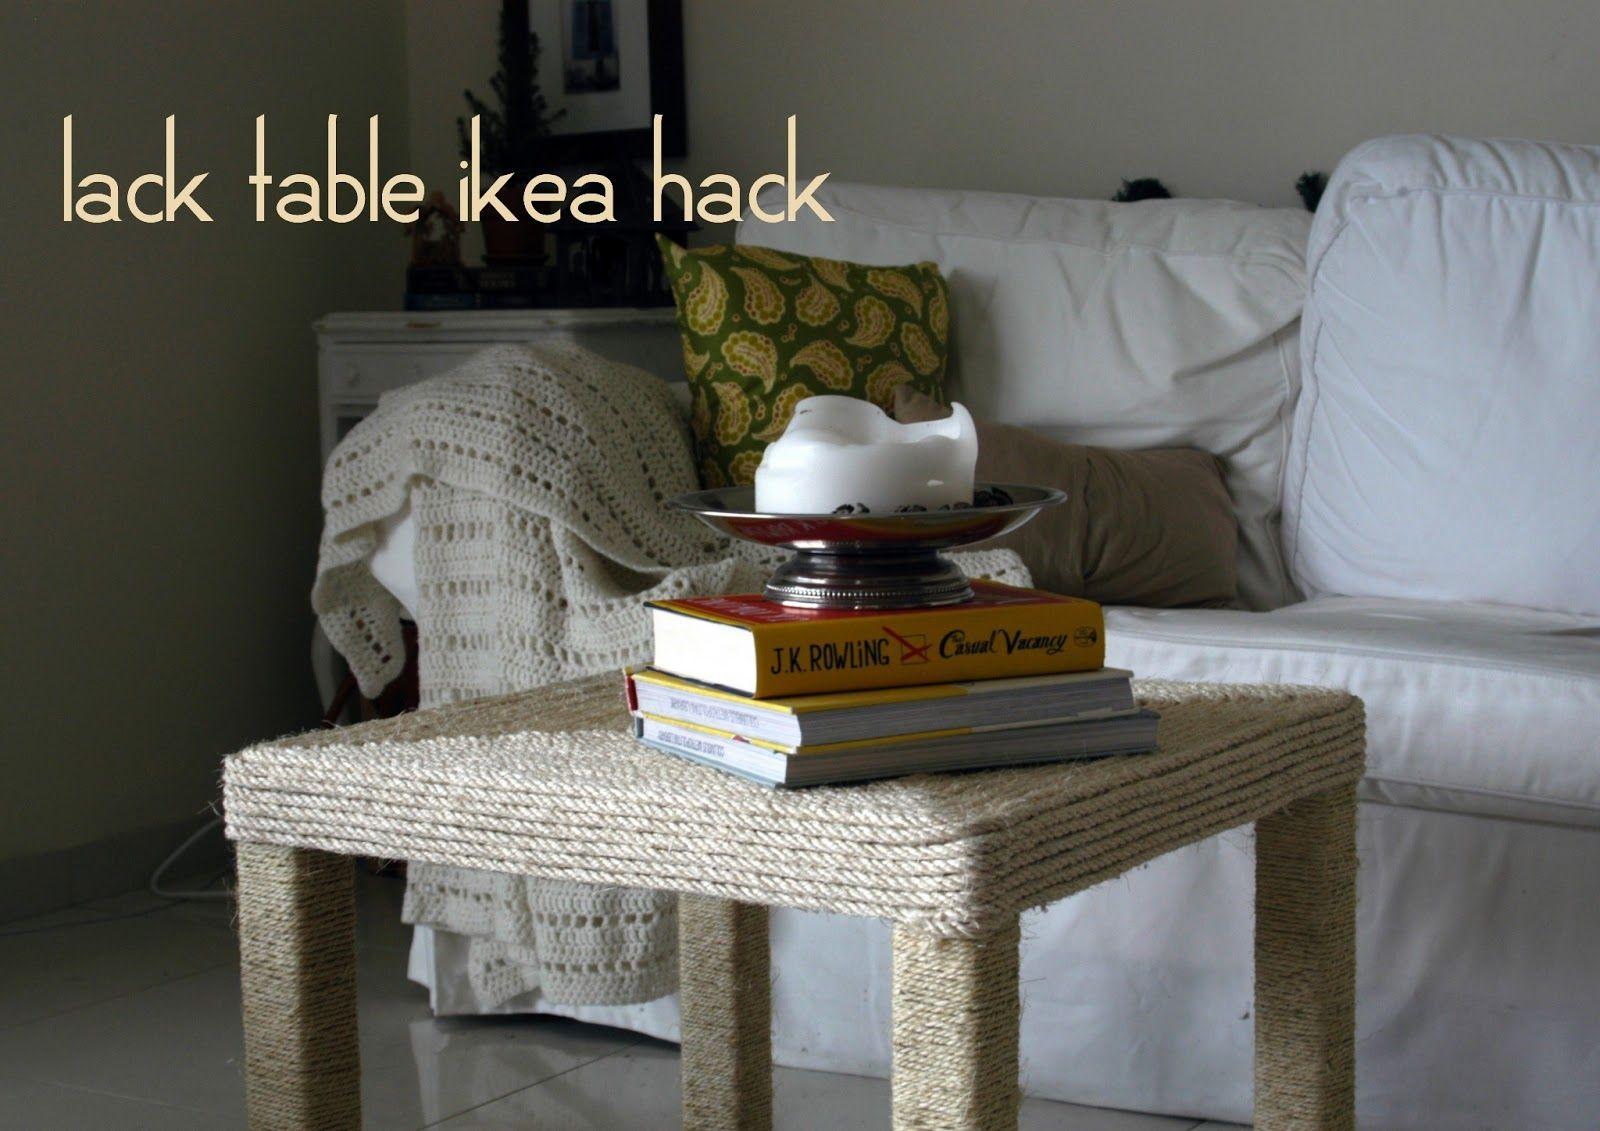 January 20136 Jpg 1600 1131 Ikea Lack Table Coffee Table Lack Coffee Table [ 1131 x 1600 Pixel ]